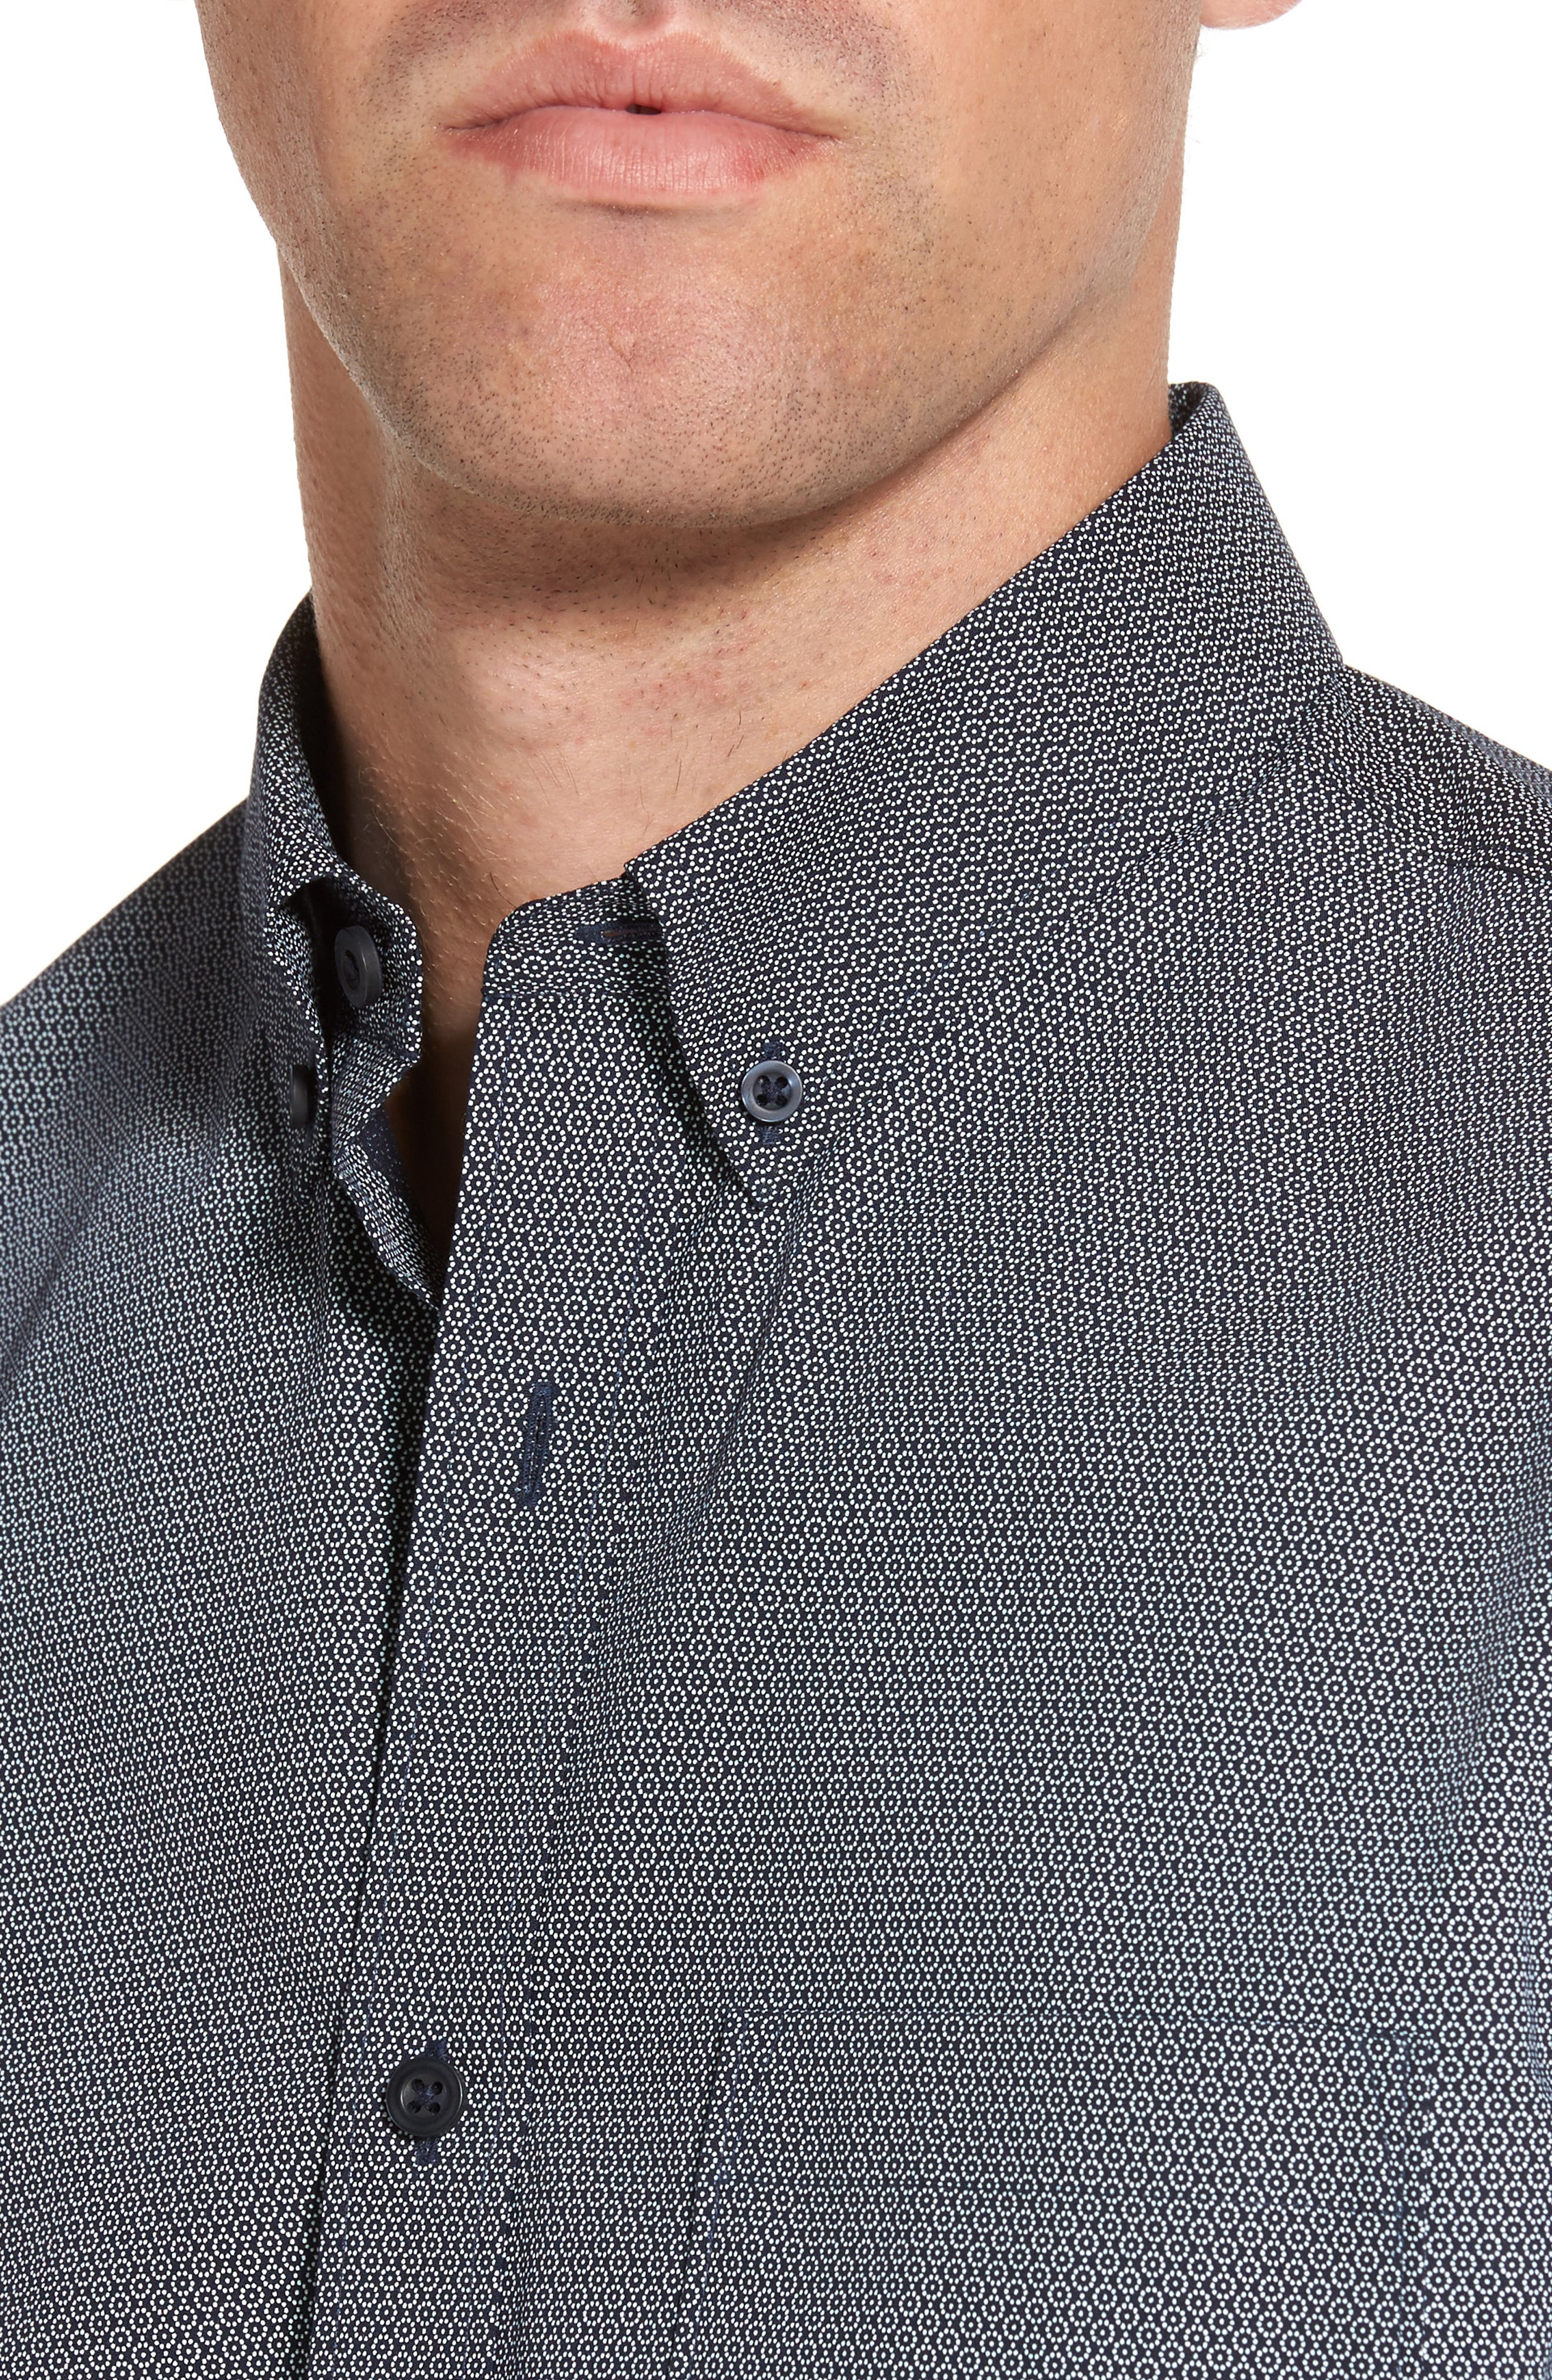 Alternate Image 4  - Nordstrom Men's Shop Slim Fit Non-Iron Dot Print Sport Shirt